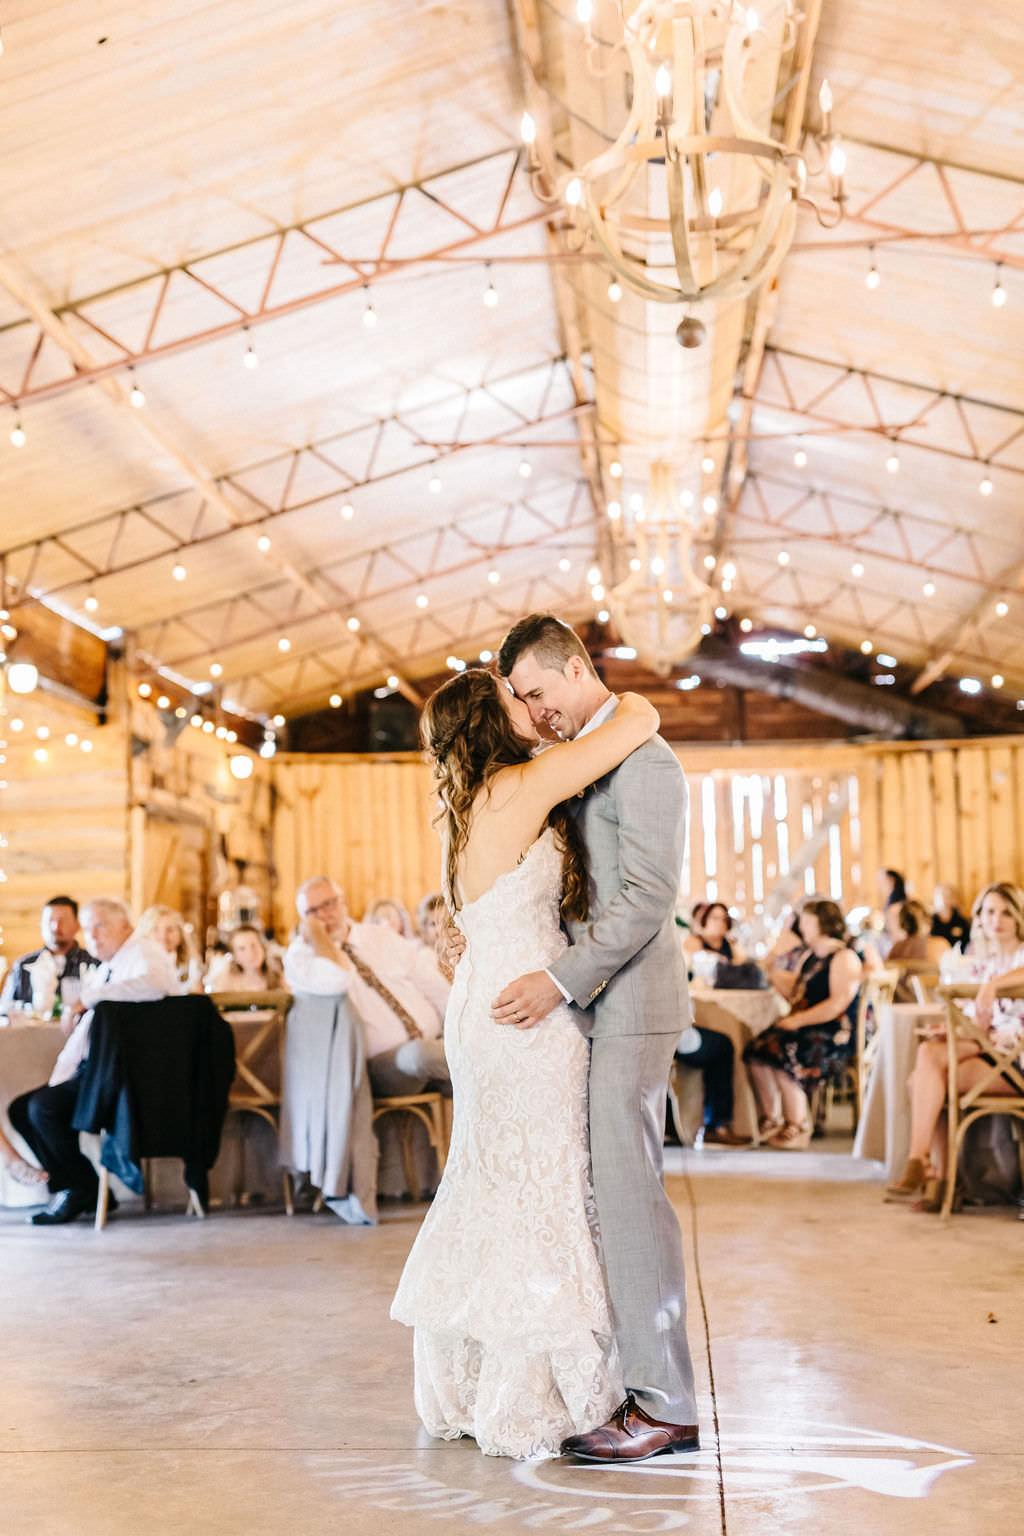 Tampa Bay Bride and Groom First Dance with String Lighting Wedding Reception Portrait   Plant City Outdoor Wedding Venue Florida Rustic Barn Weddings